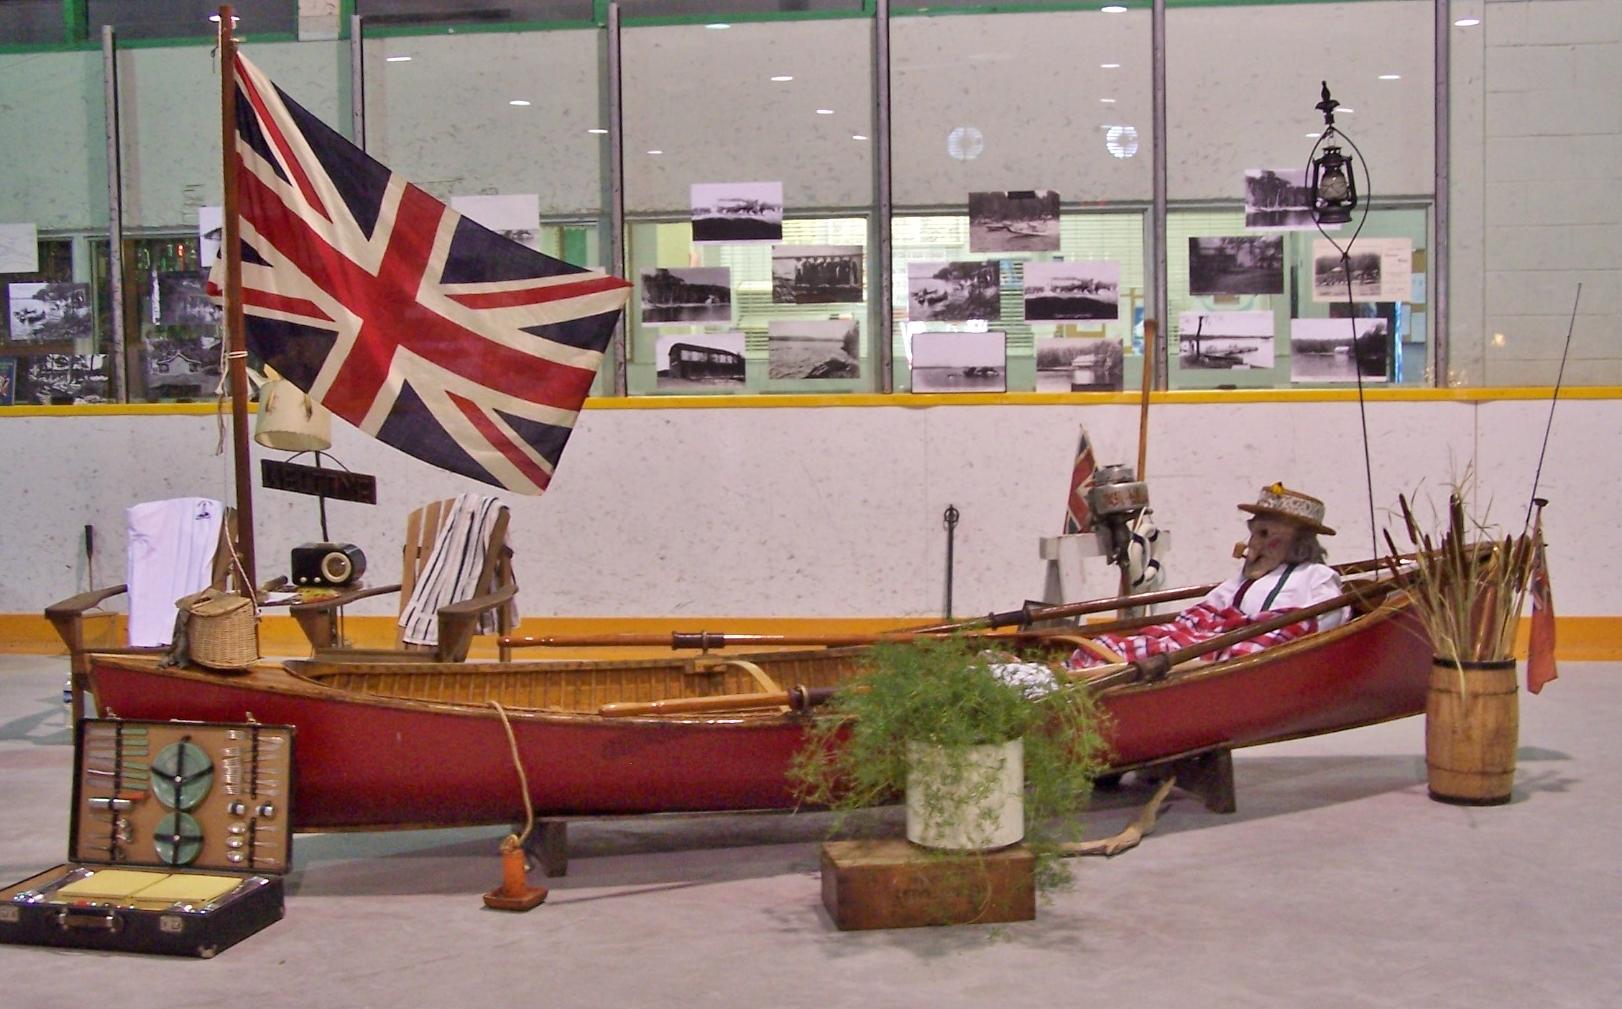 2005 Ebenezer in a canoe